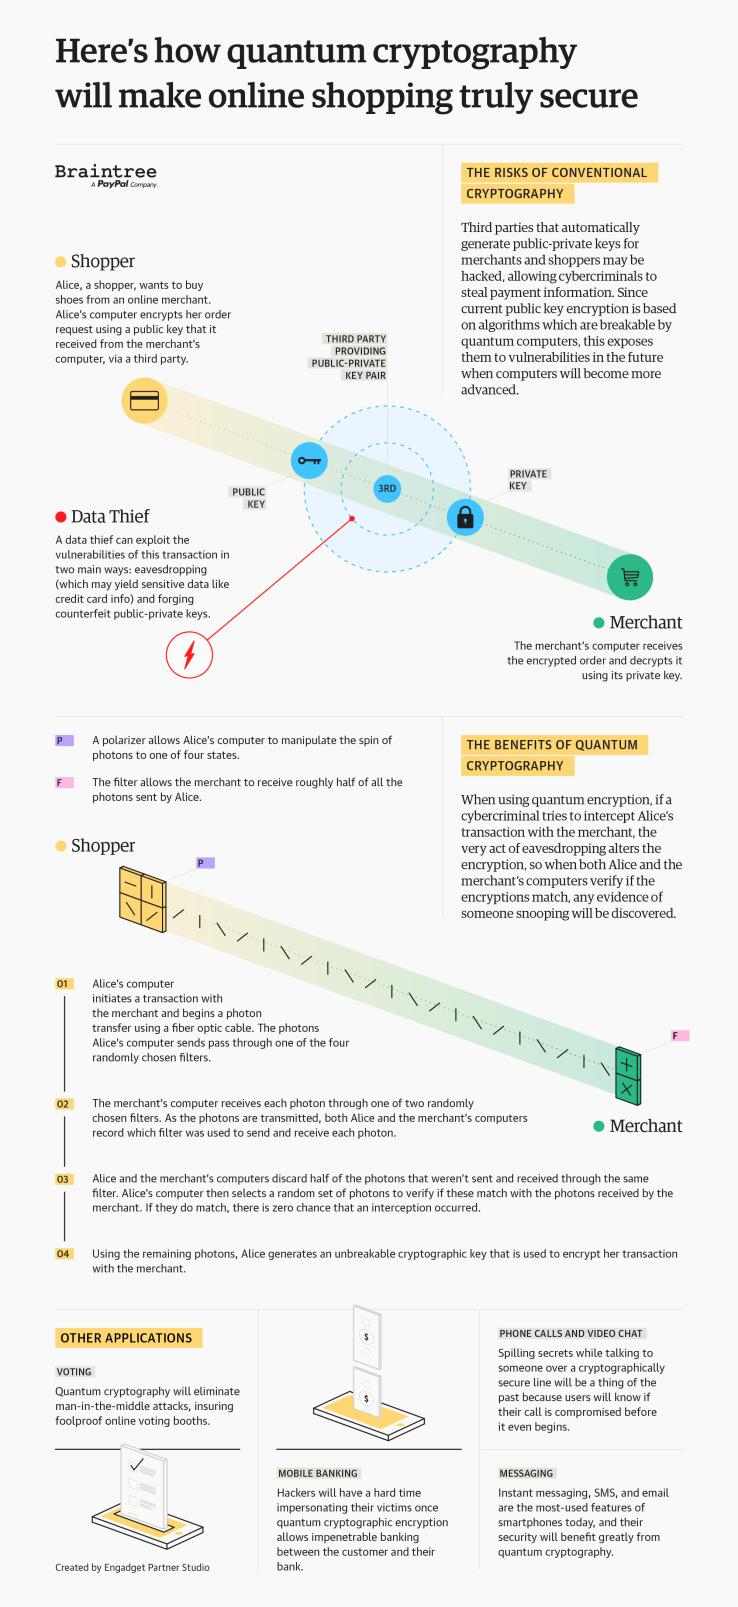 quantum-cryptography-braintree